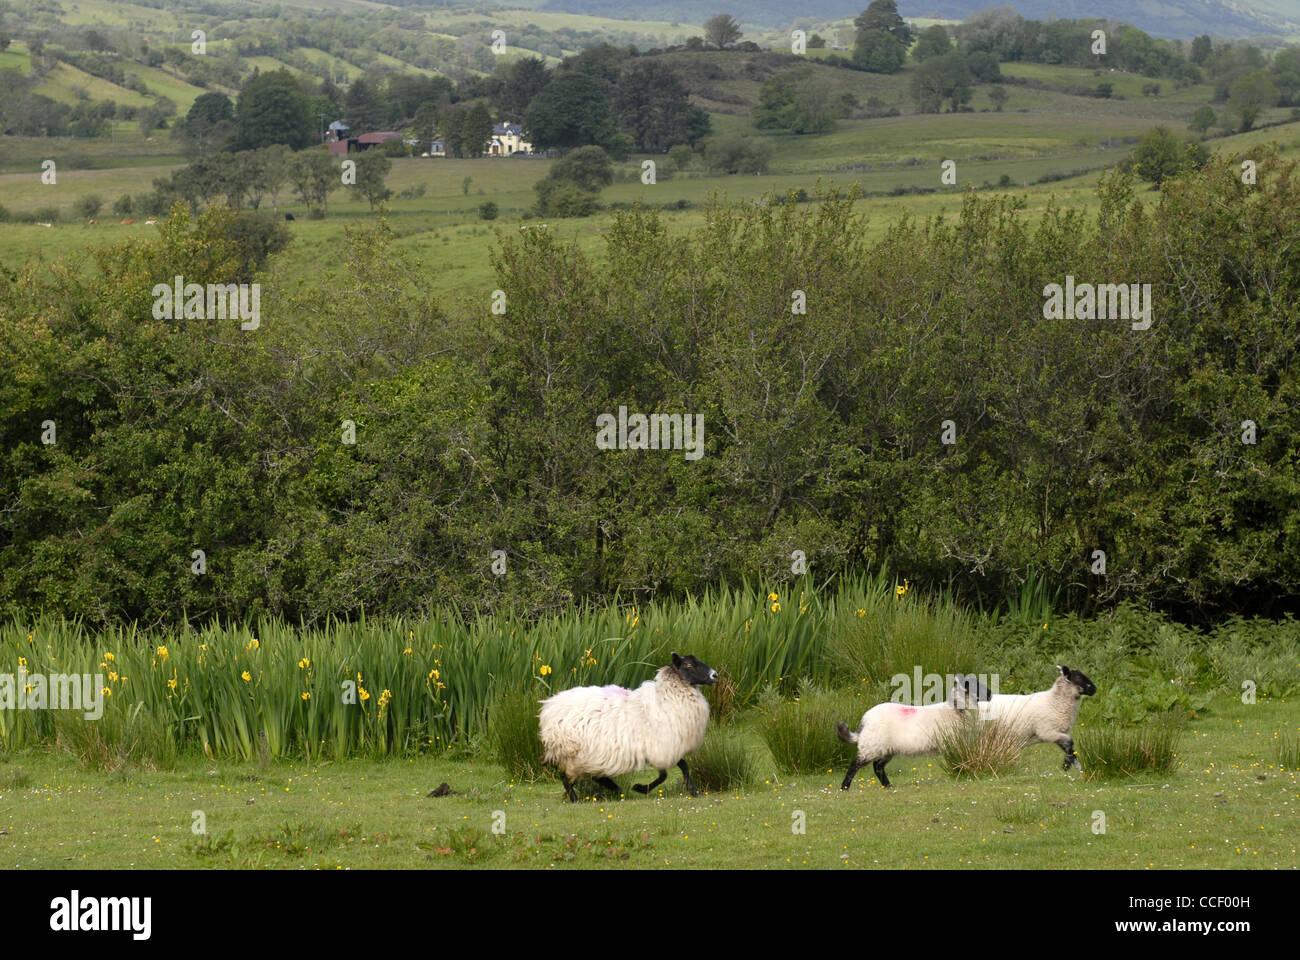 Near Castletown, The Cuéllar Trail, Castletown, County Laois, Leinster, Ireland, Europe. - Stock Image